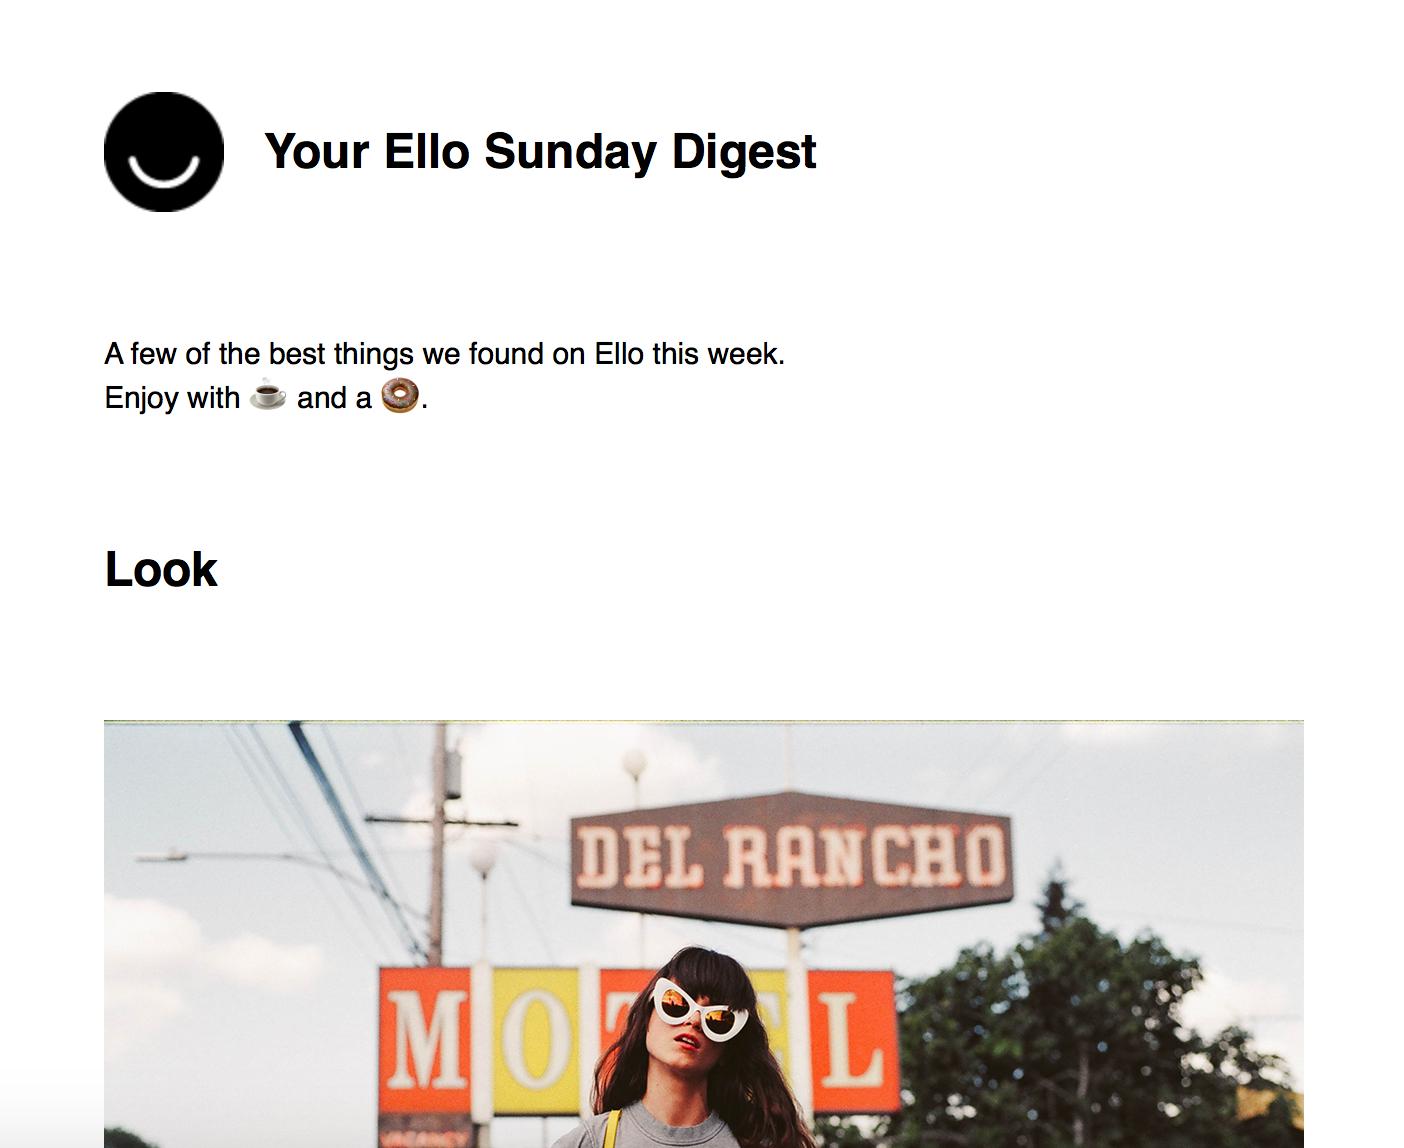 Ello Sunday digest email